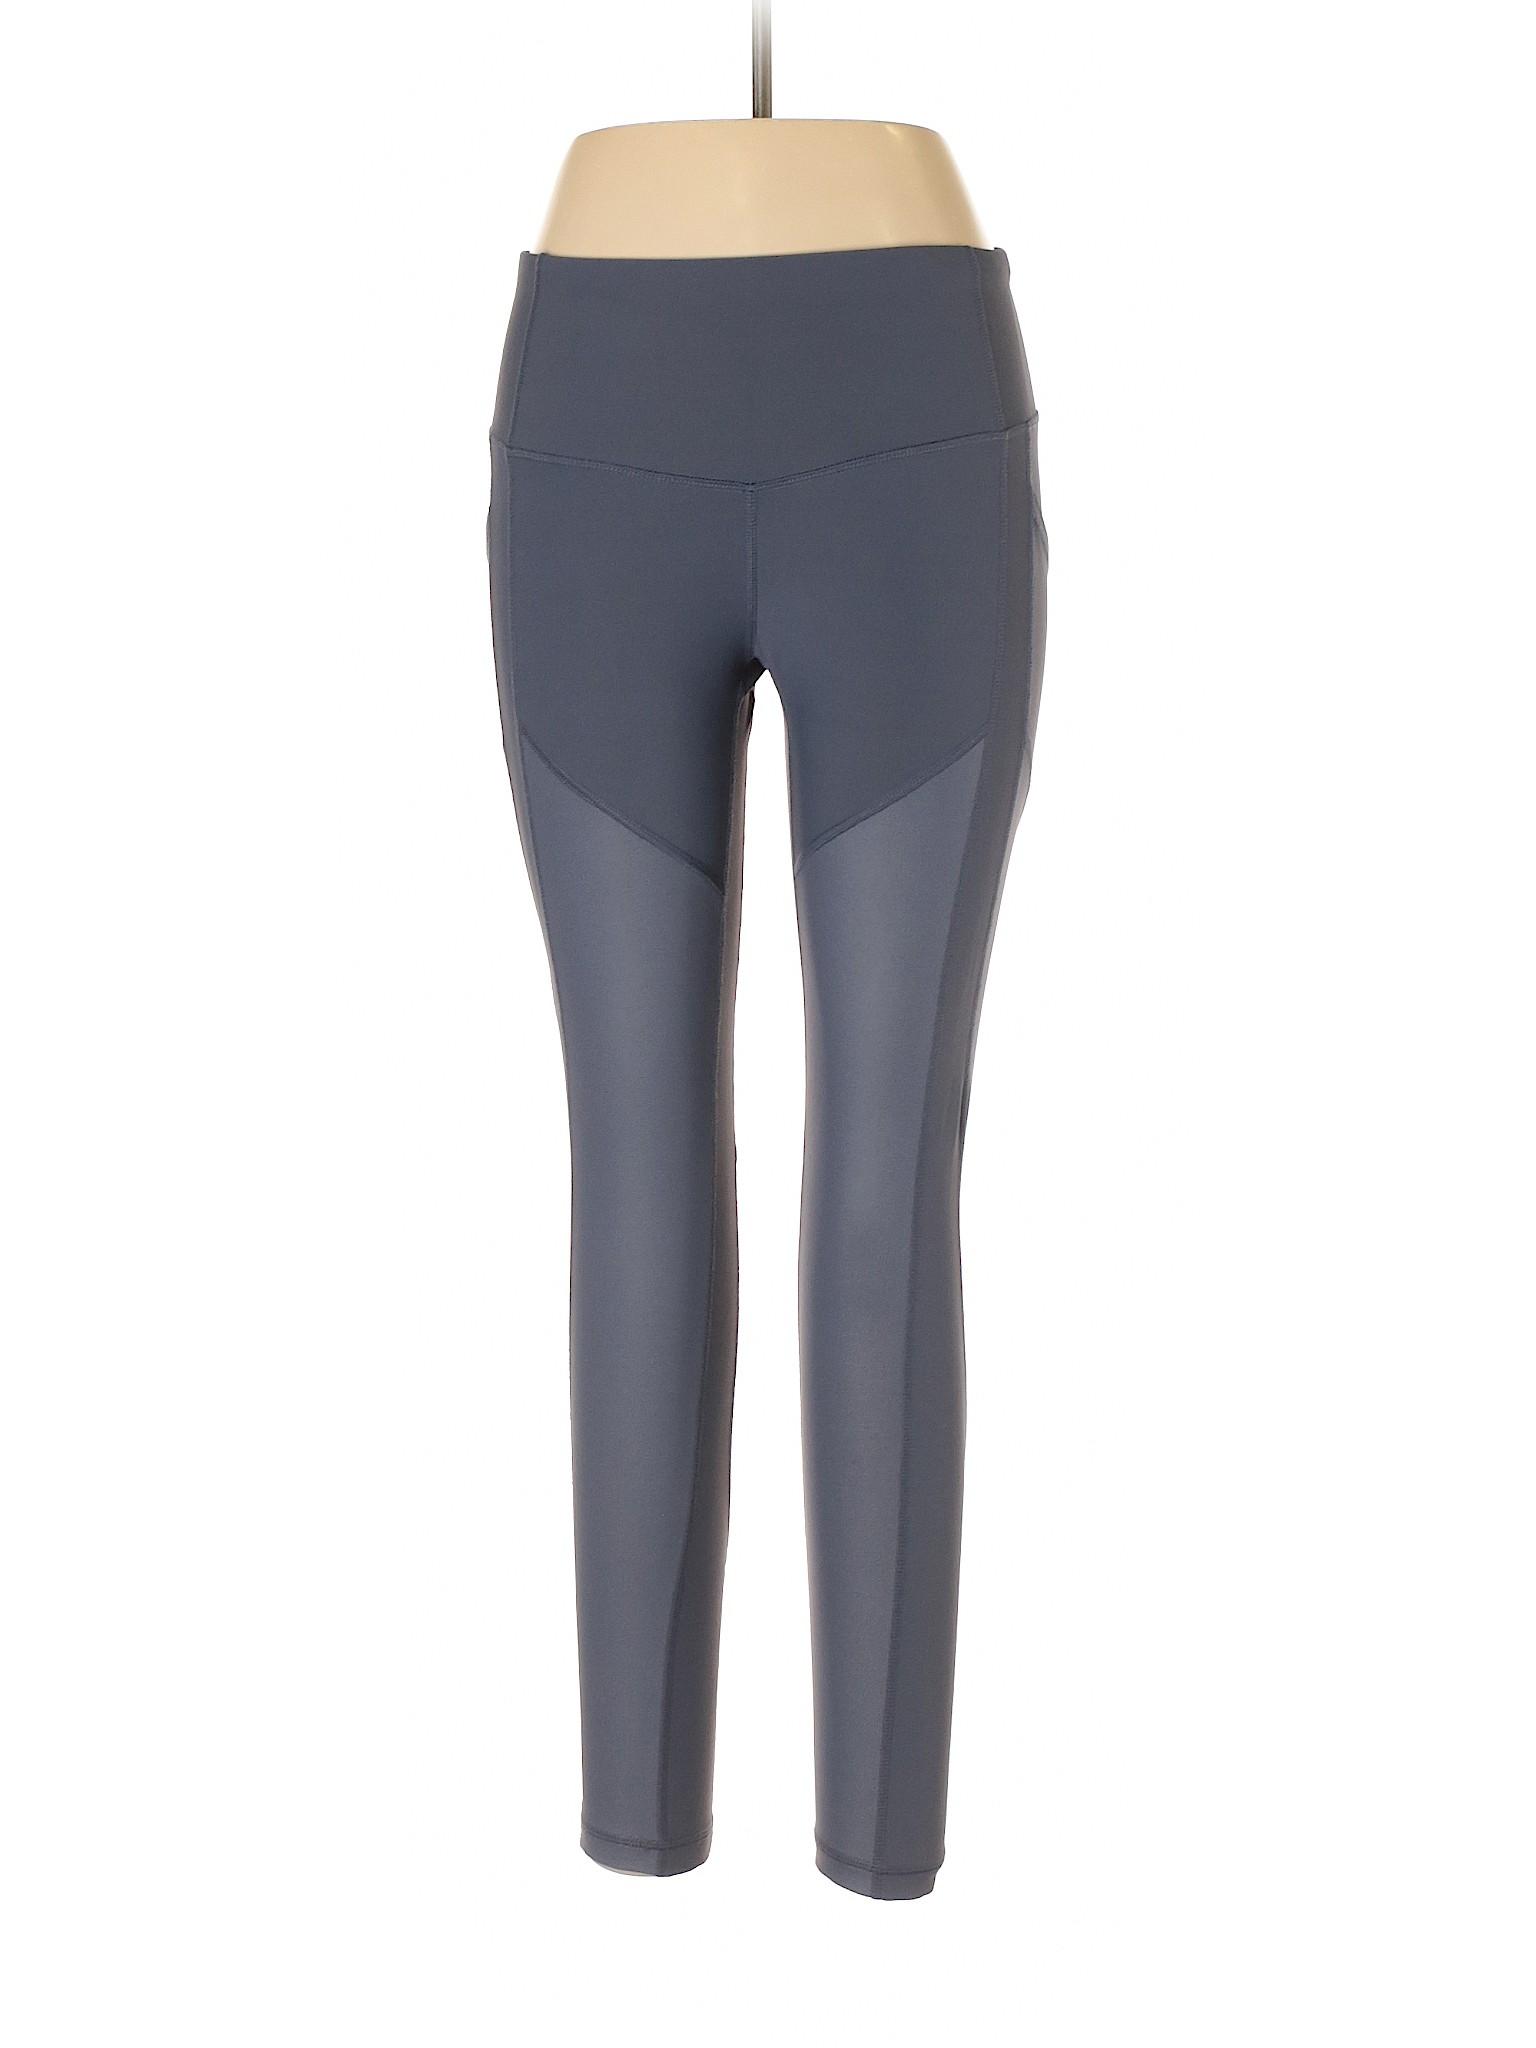 Degrees winter by Pants Active Reflex Boutique 90 qOwxECpZ